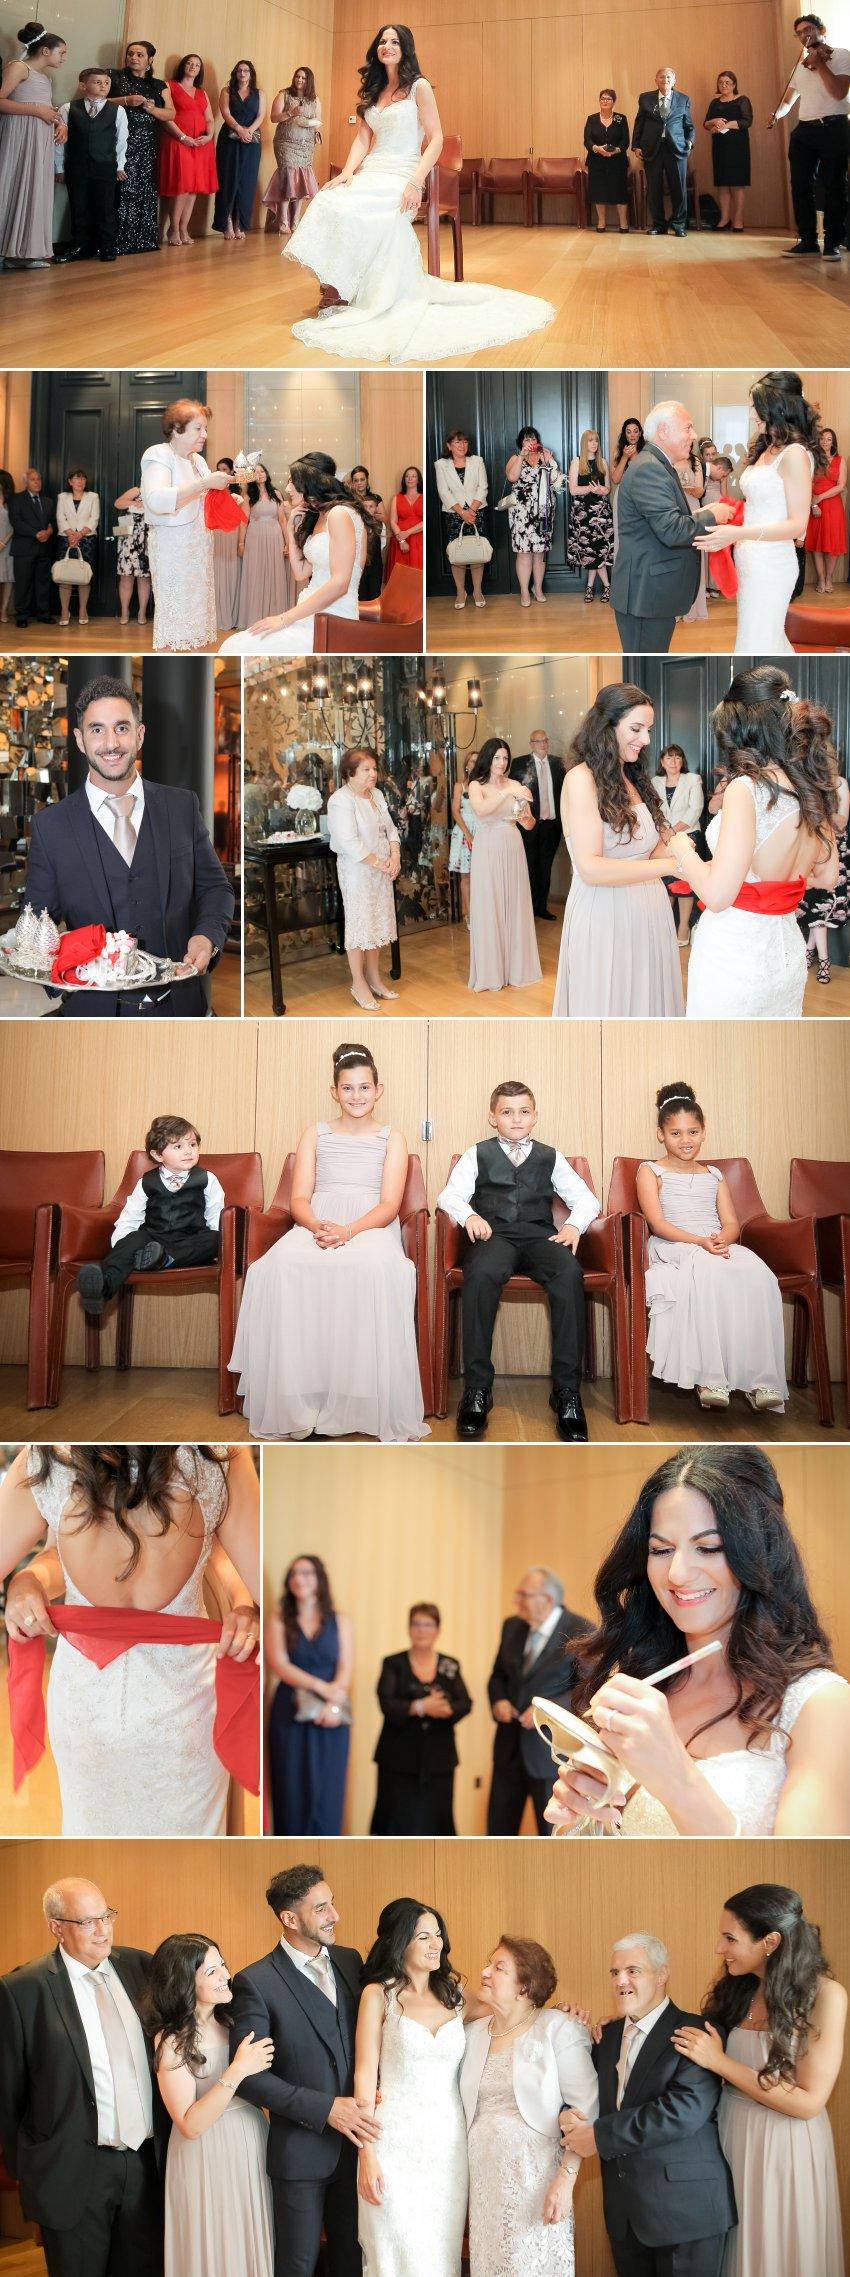 06 Nigerian wedding at Rosewood Hotel